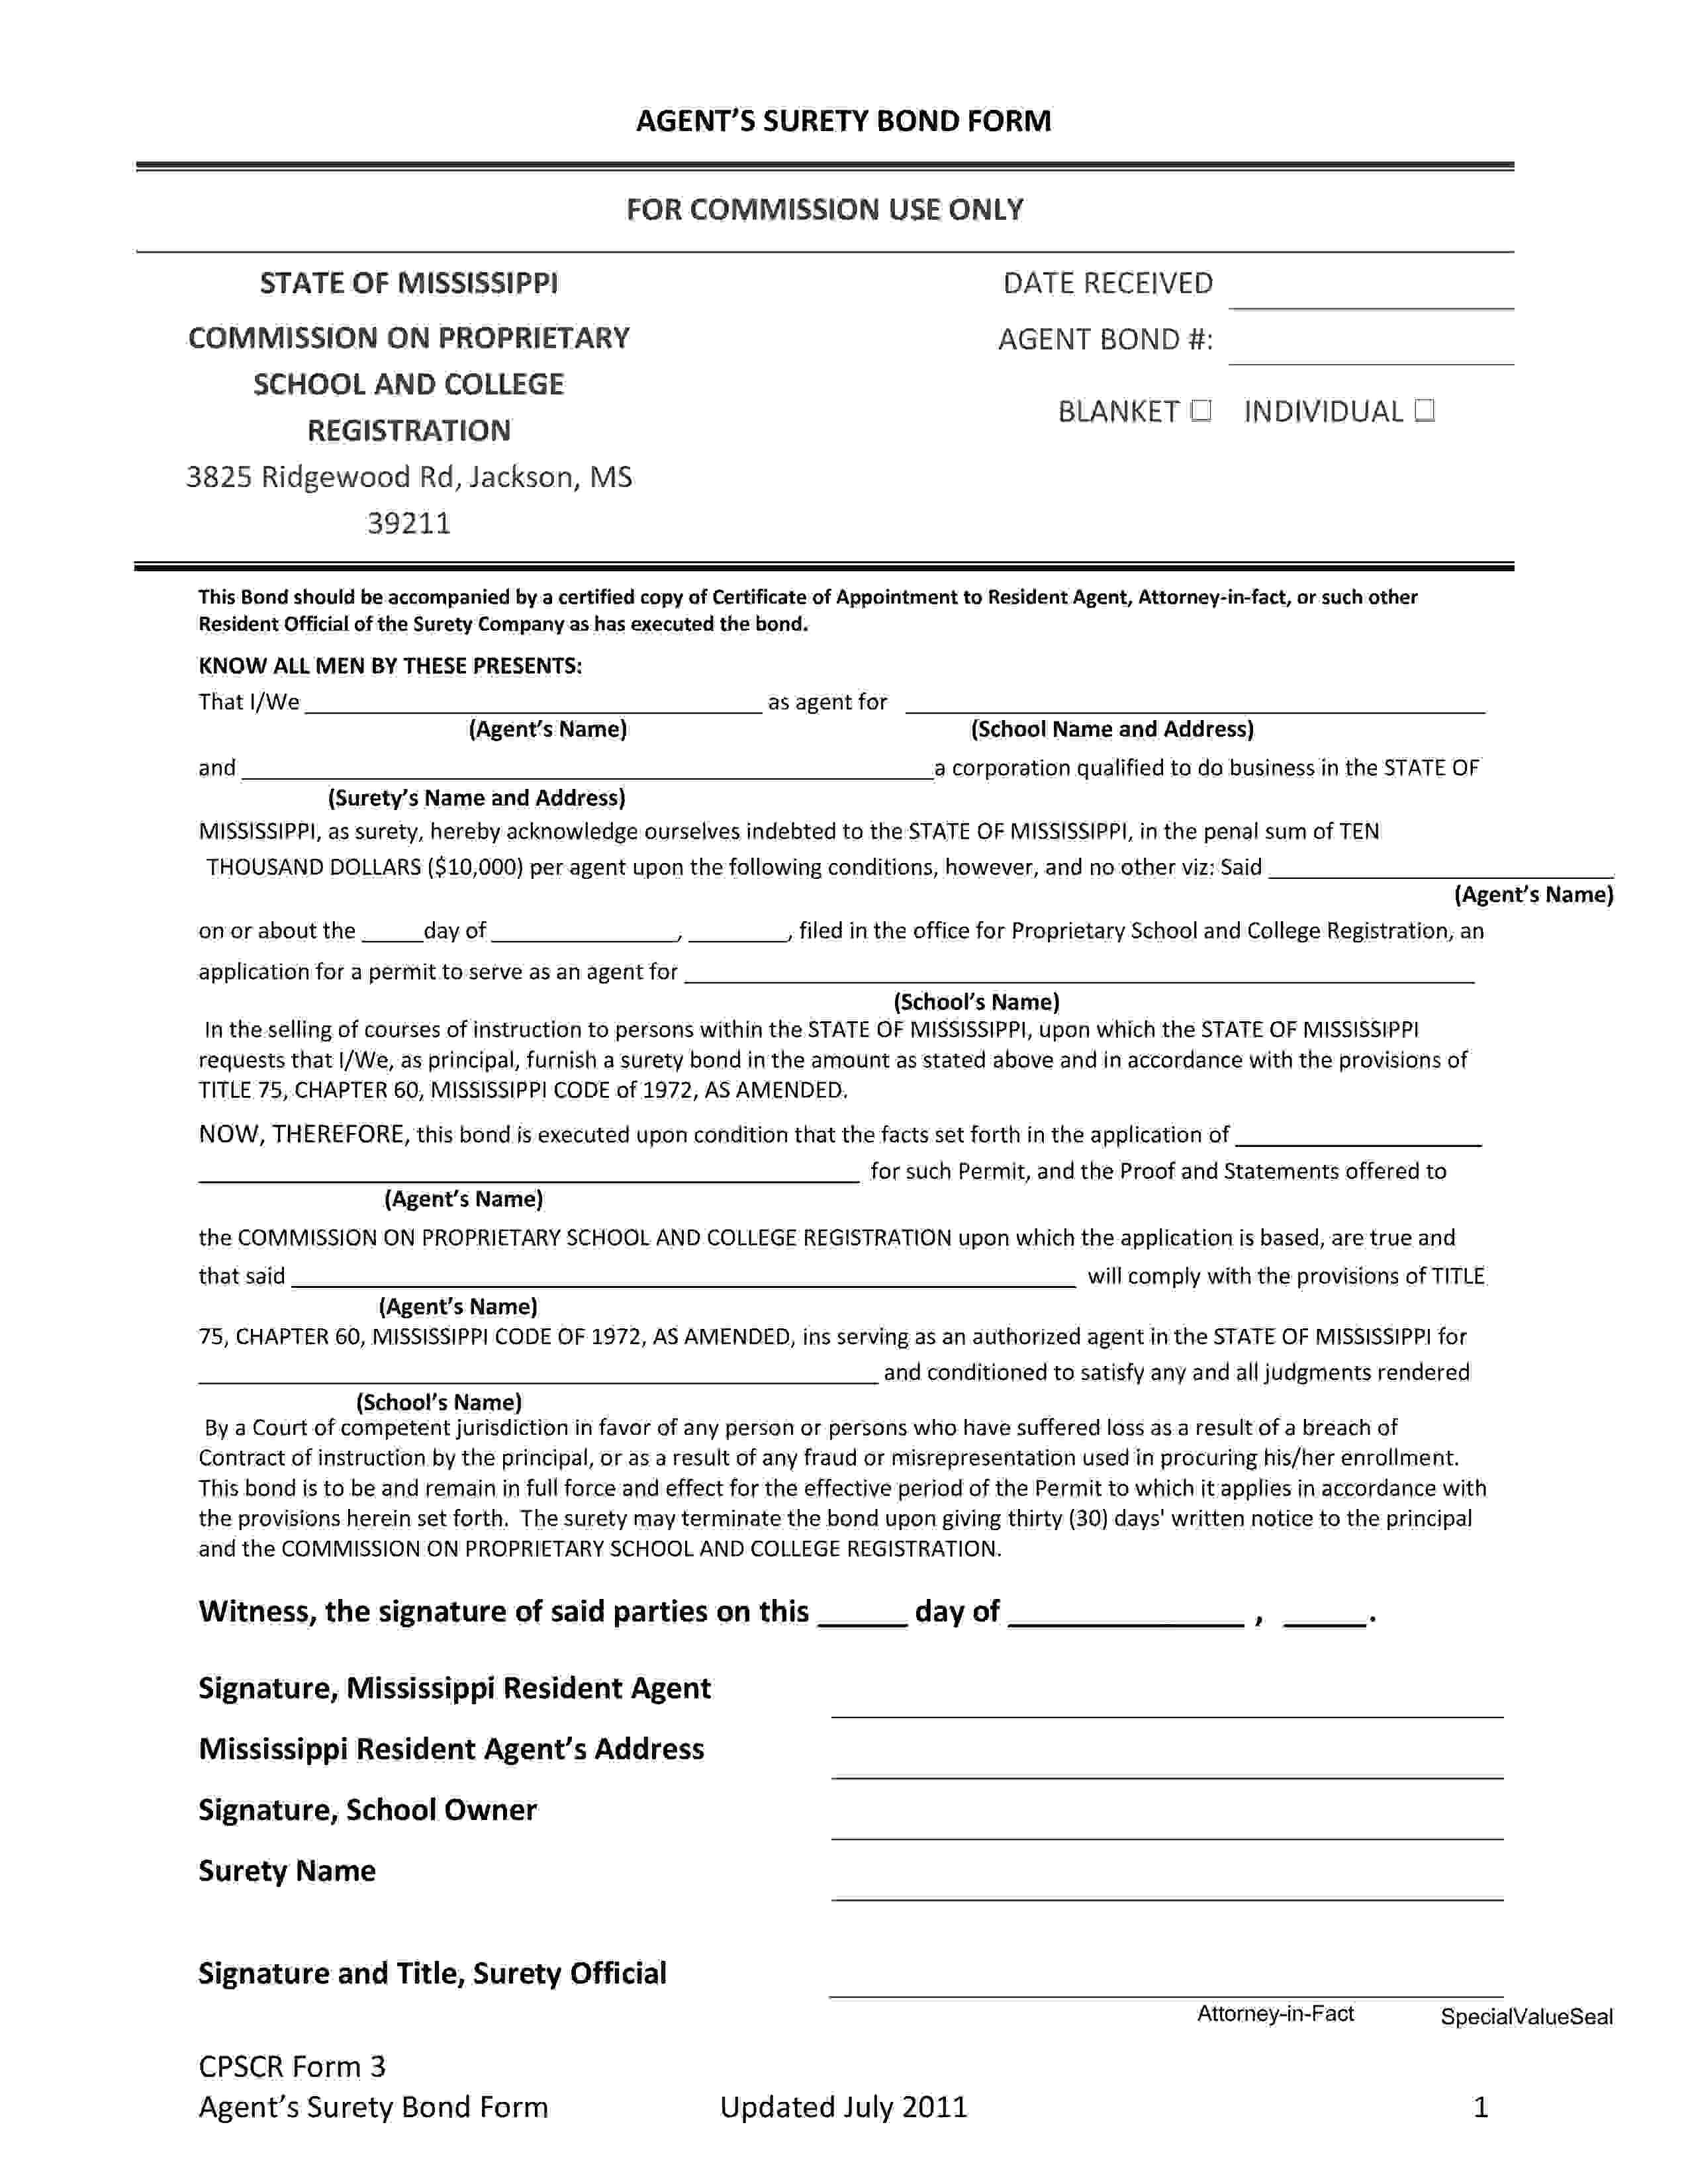 Mississippi Commission on Proprietary School and College Registration Proprietary School Agent - Individual Bond sample image